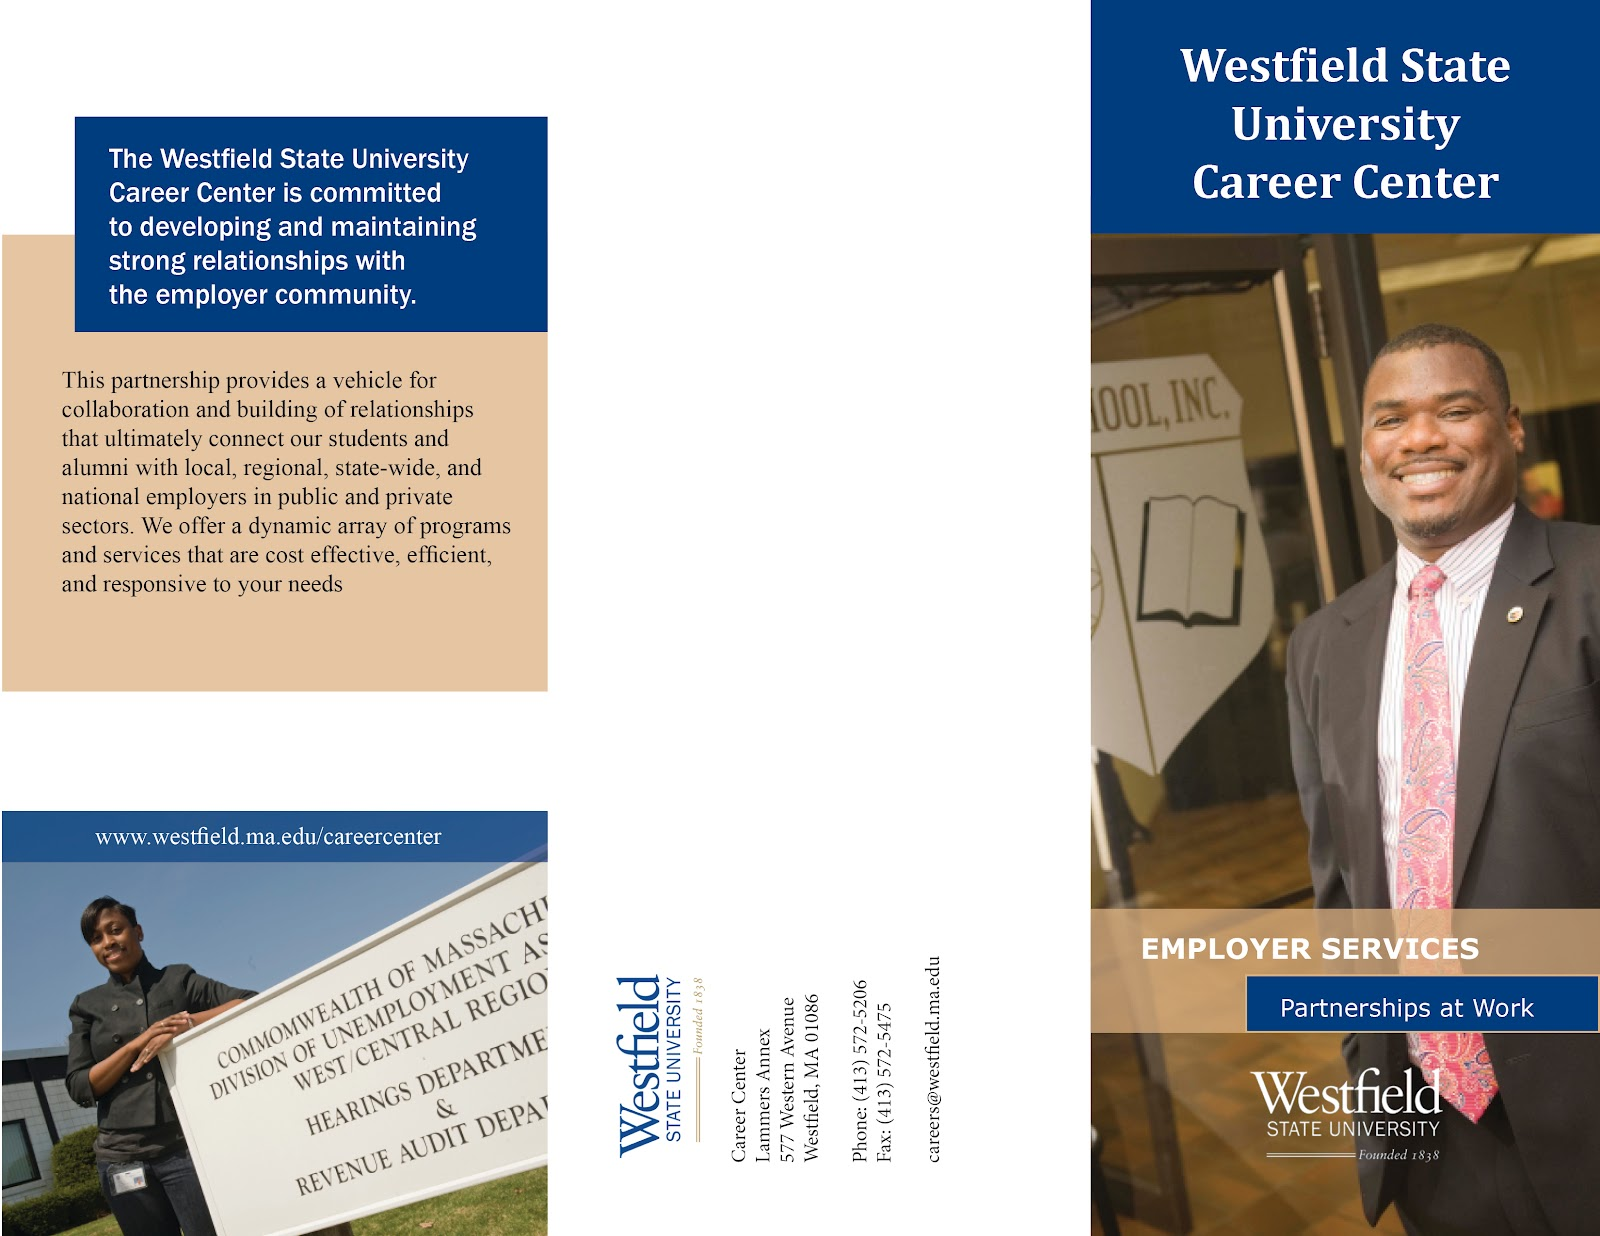 Alycia Designs Wsu Career Center Brochure